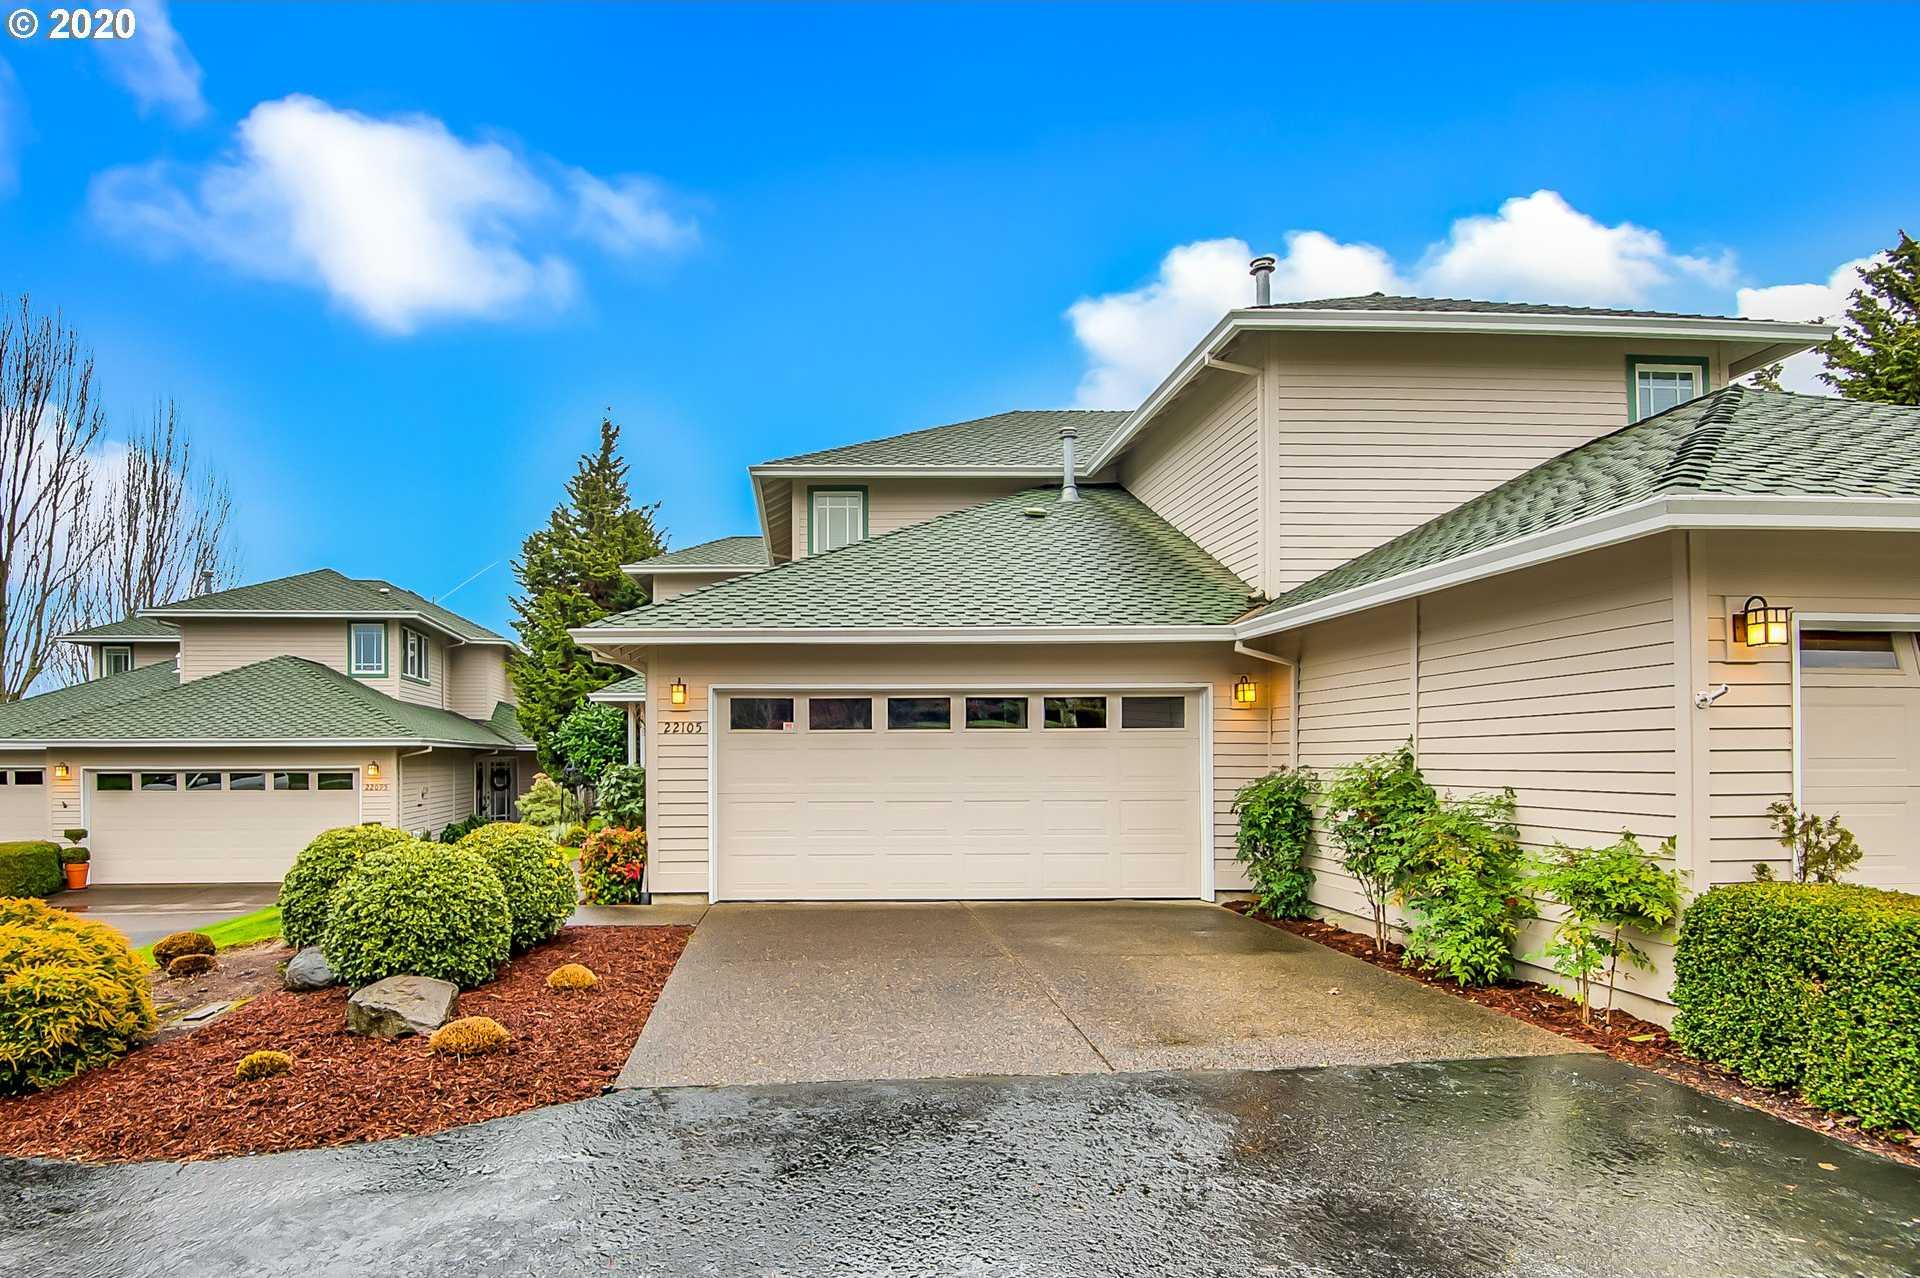 $515,000 - 2Br/3Ba -  for Sale in Cascade Summit, West Linn